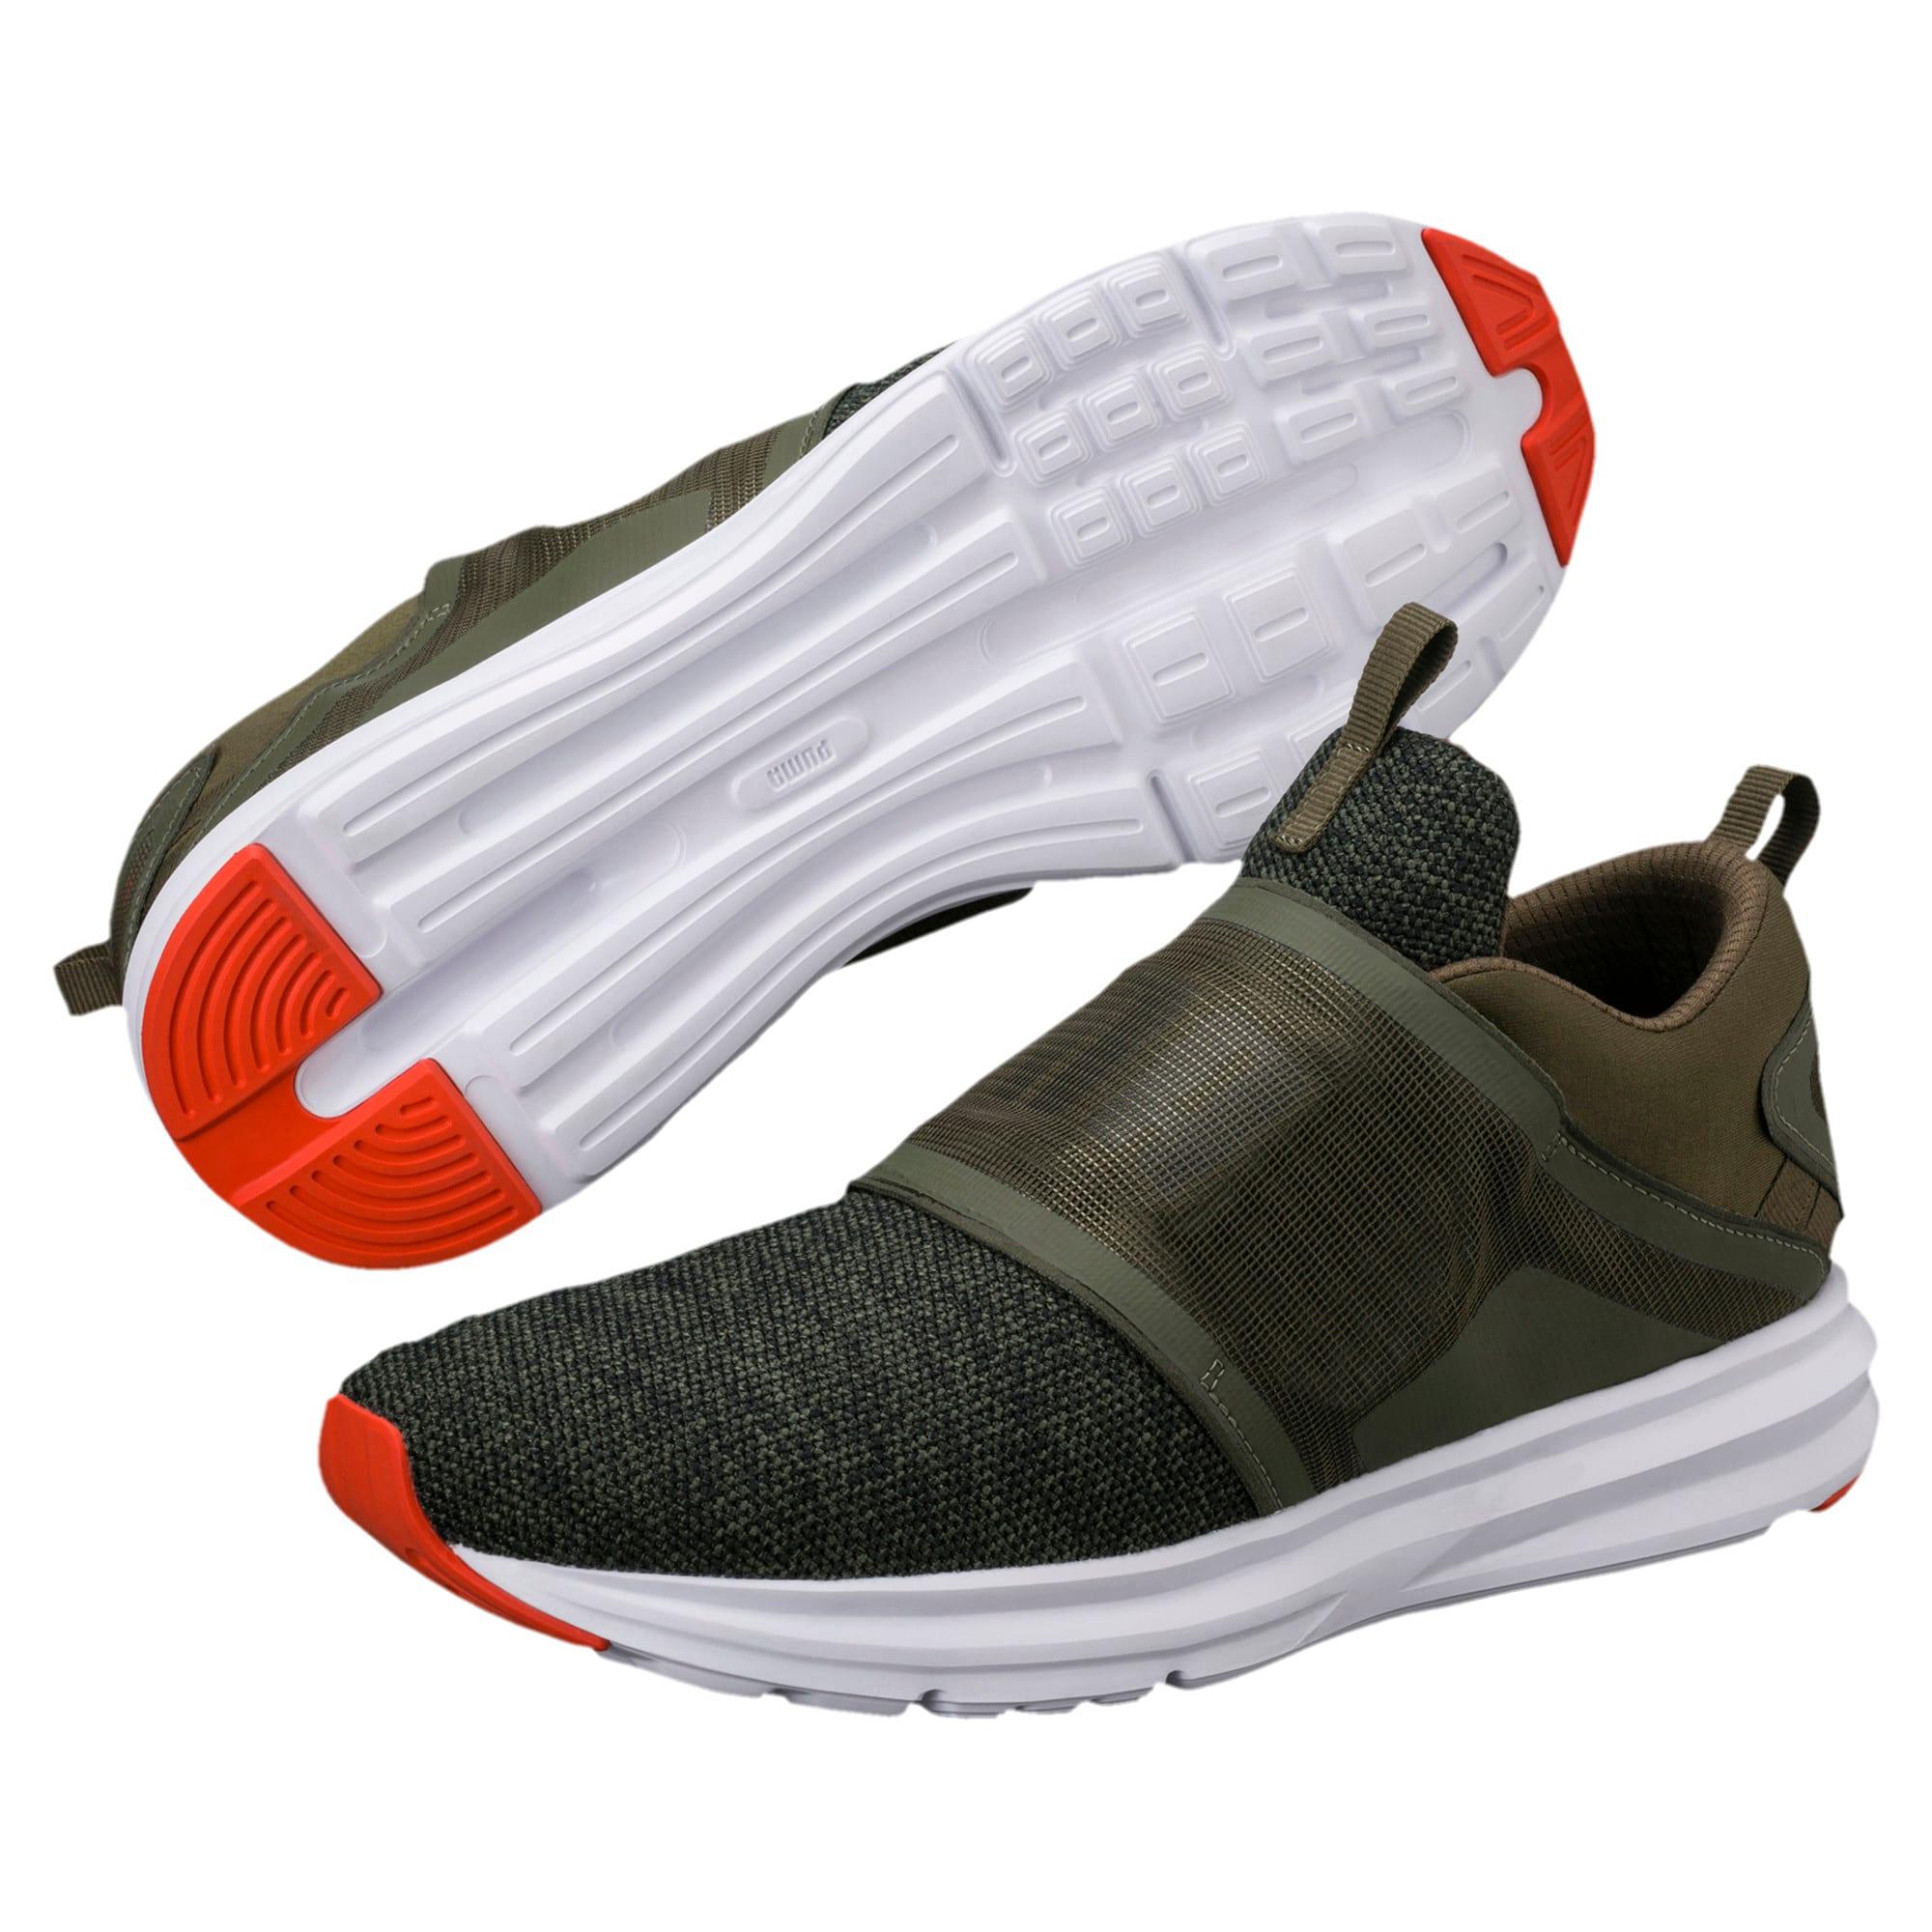 Details zu Puma Enzo Strap Schuhe Herren Sneaker Grau